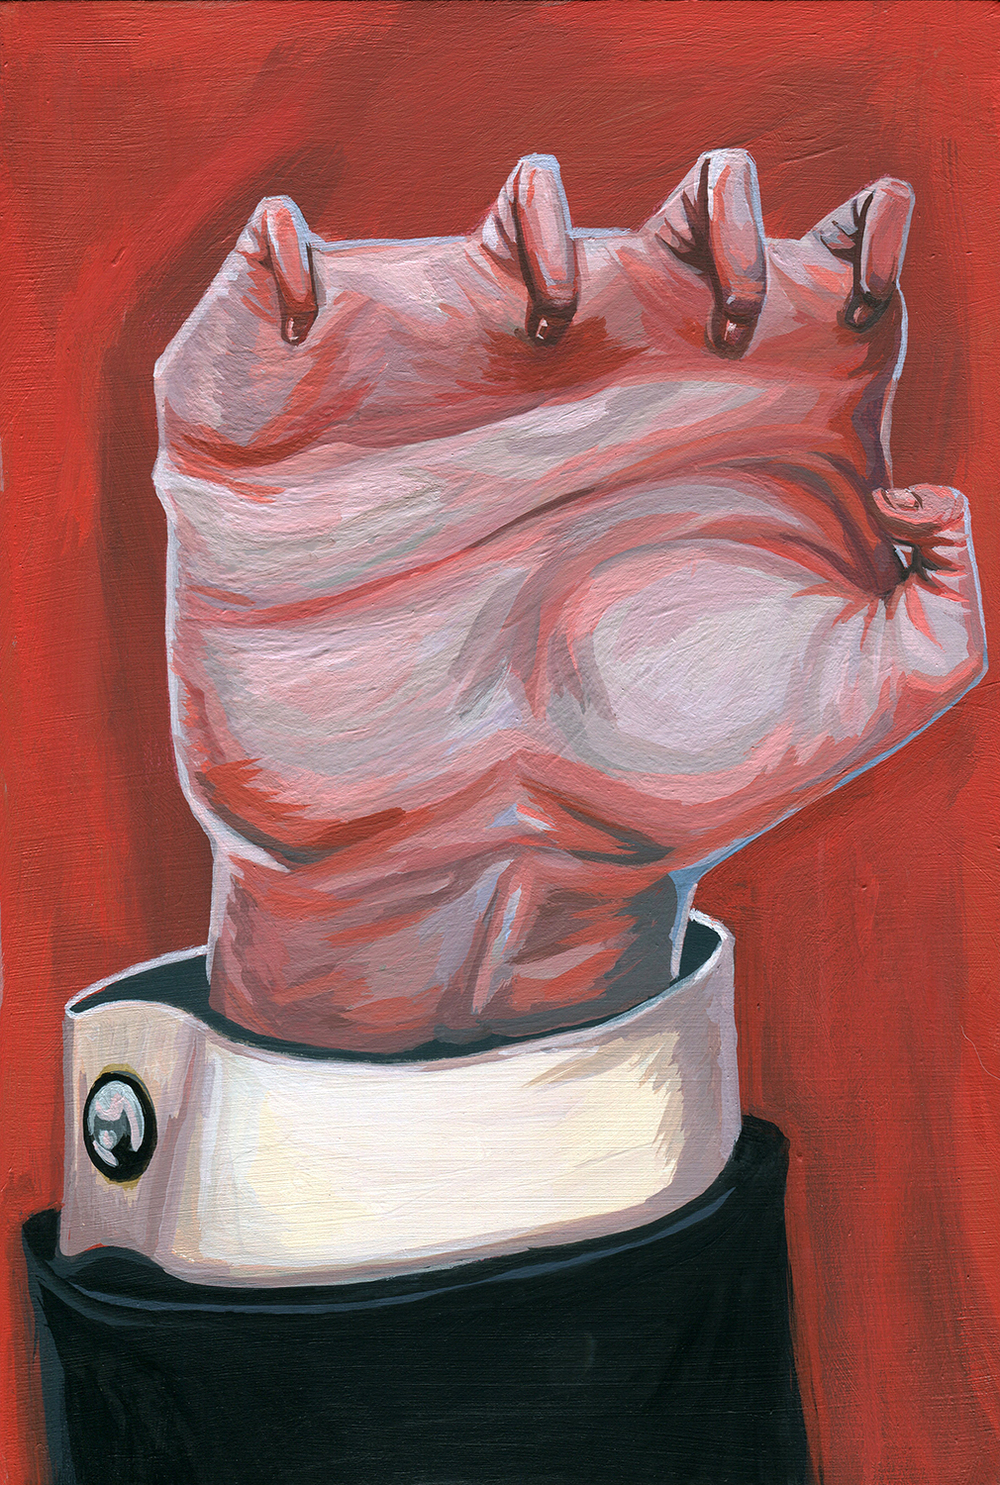 Donald Trump's Iron Fist